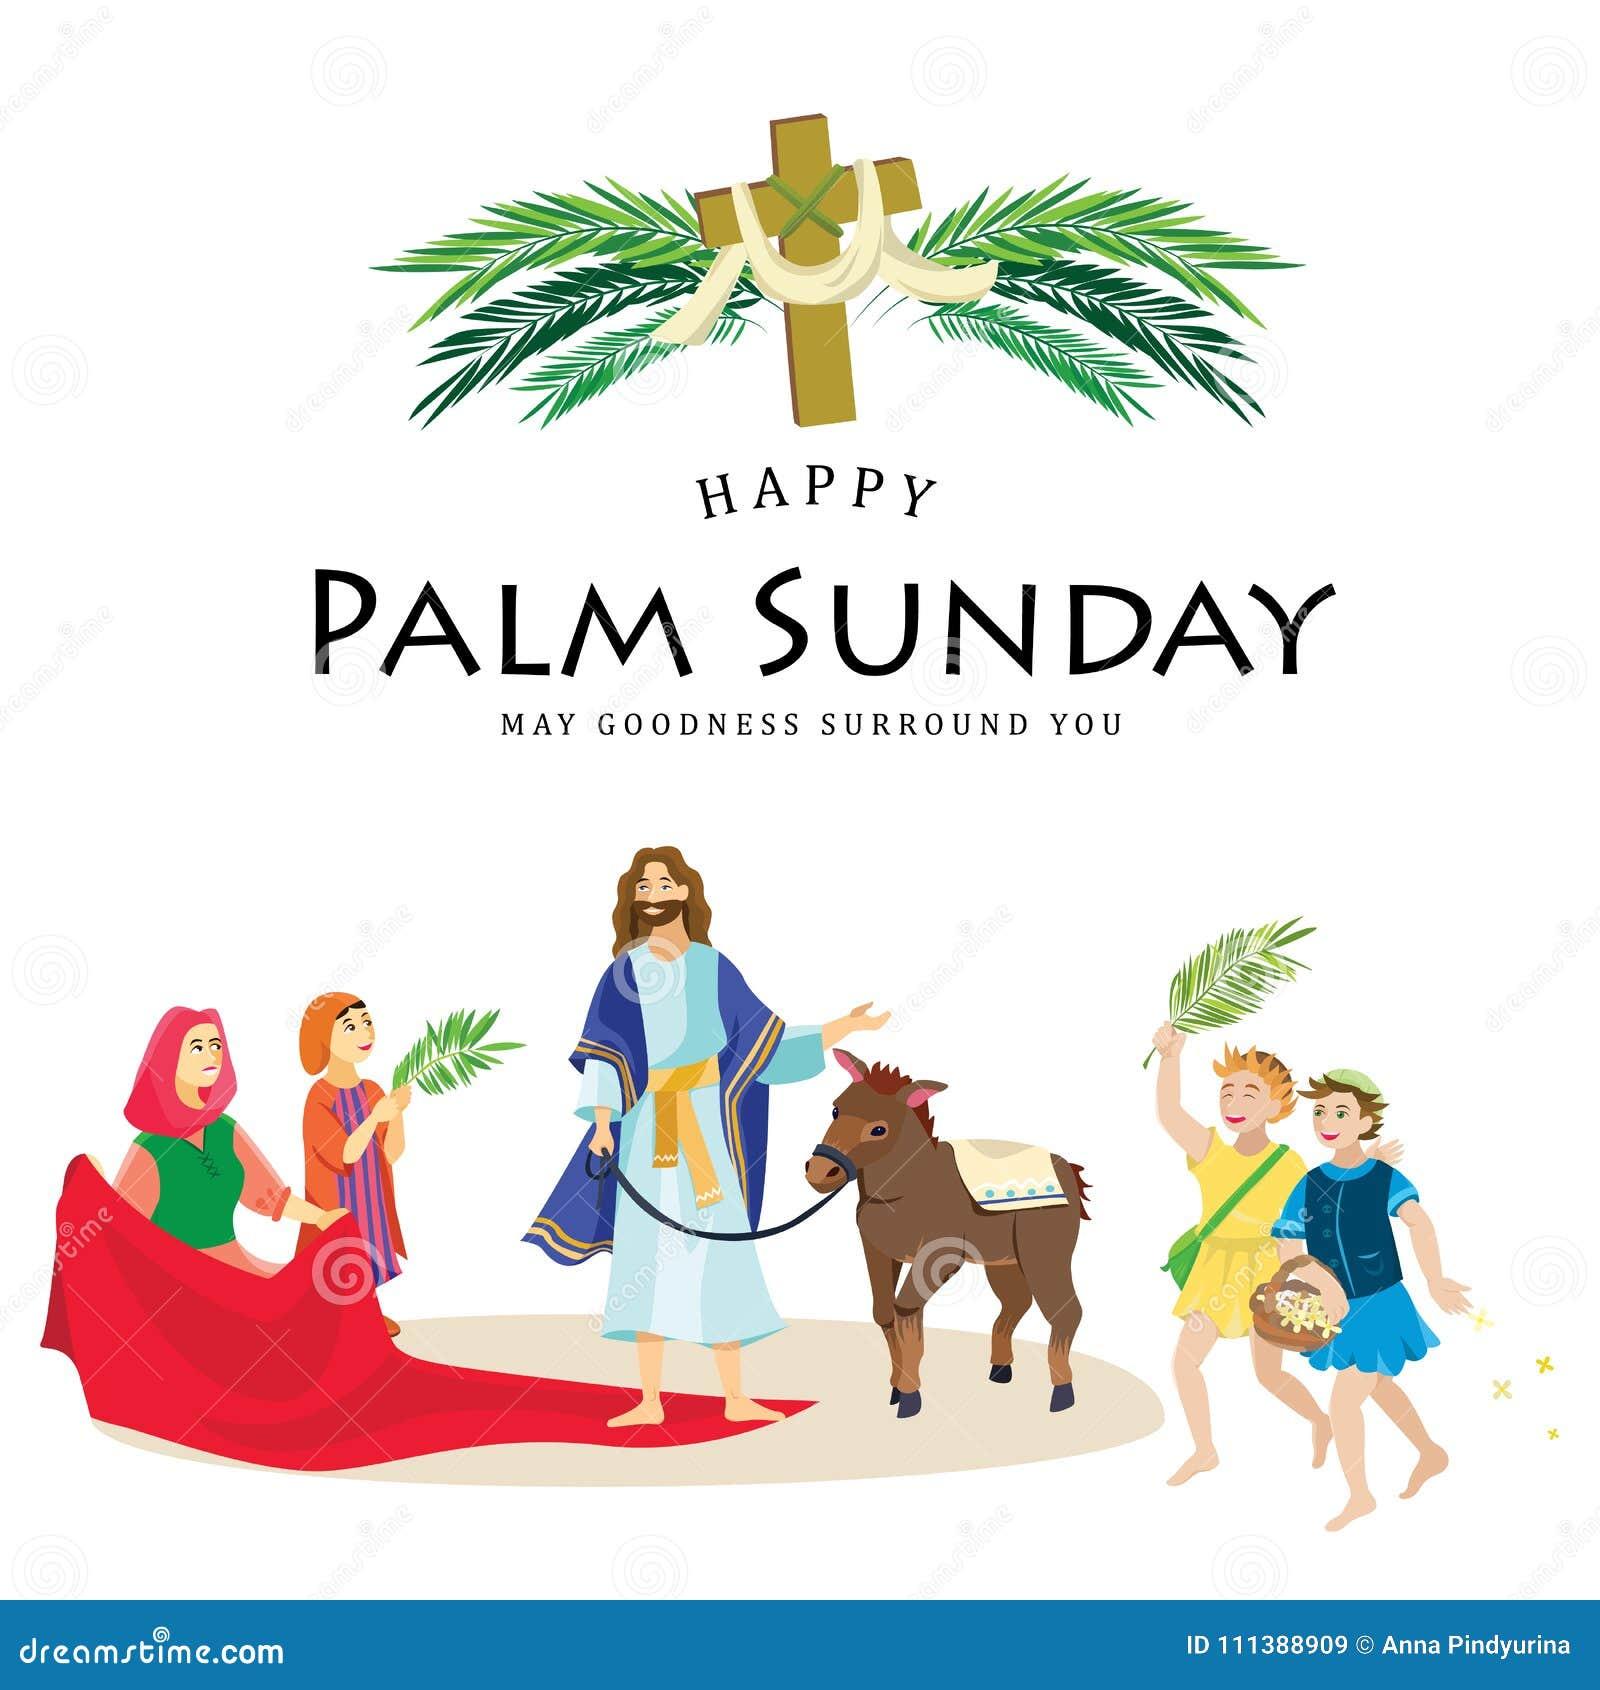 Religion Holiday Palm Sunday Before Easter, Celebration Of The ...